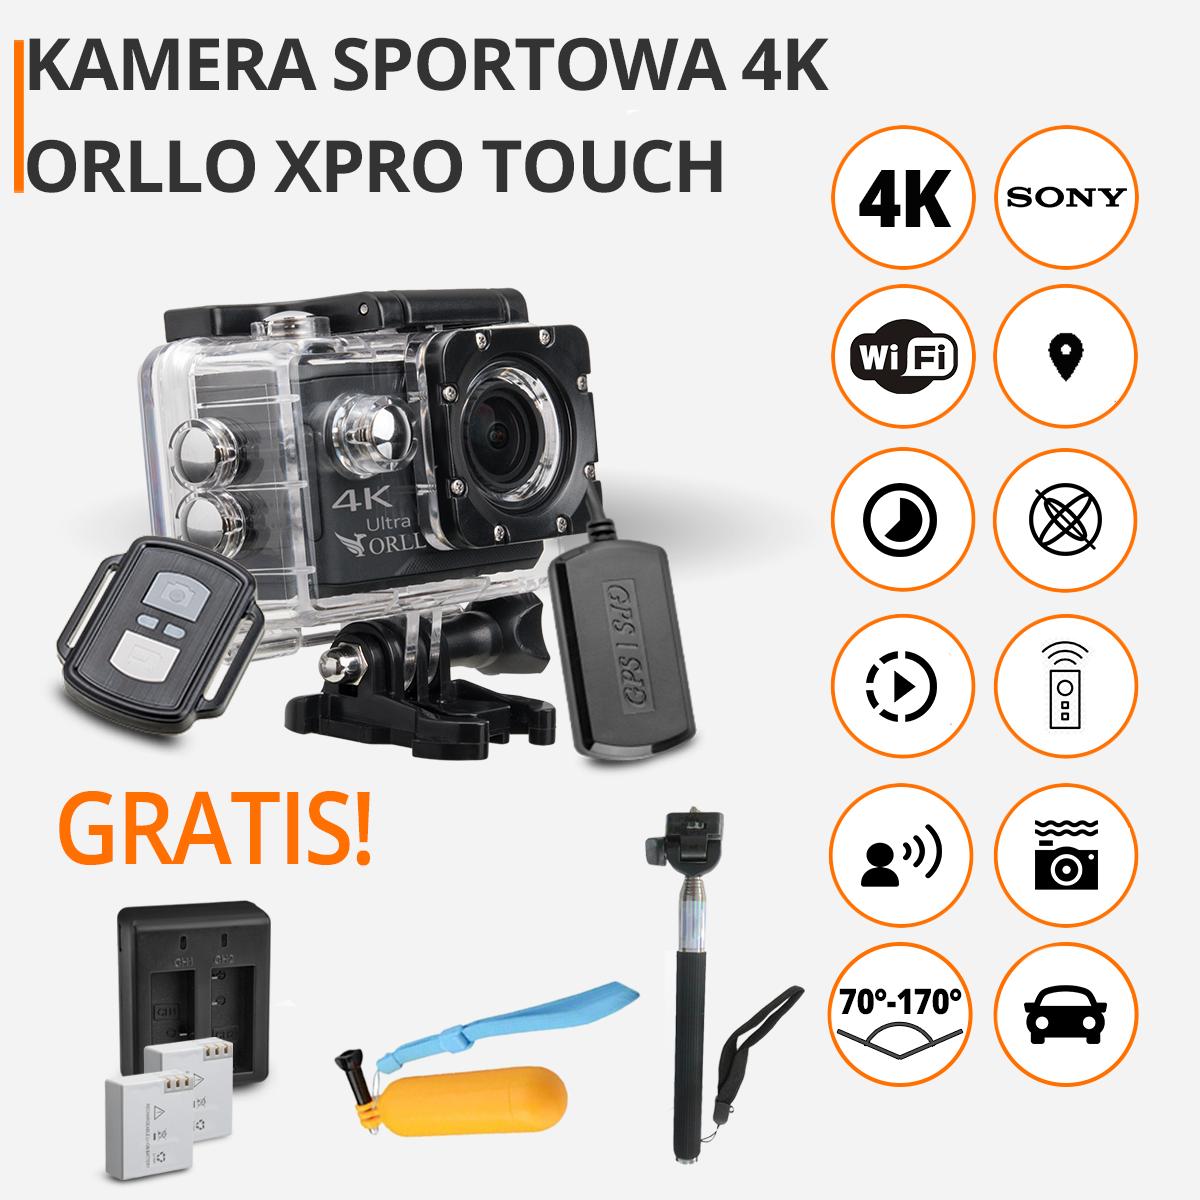 2b2cafc3085e1b Kamera Sportowa 4K na motor Sony Cena Sklep ORLLO.PL